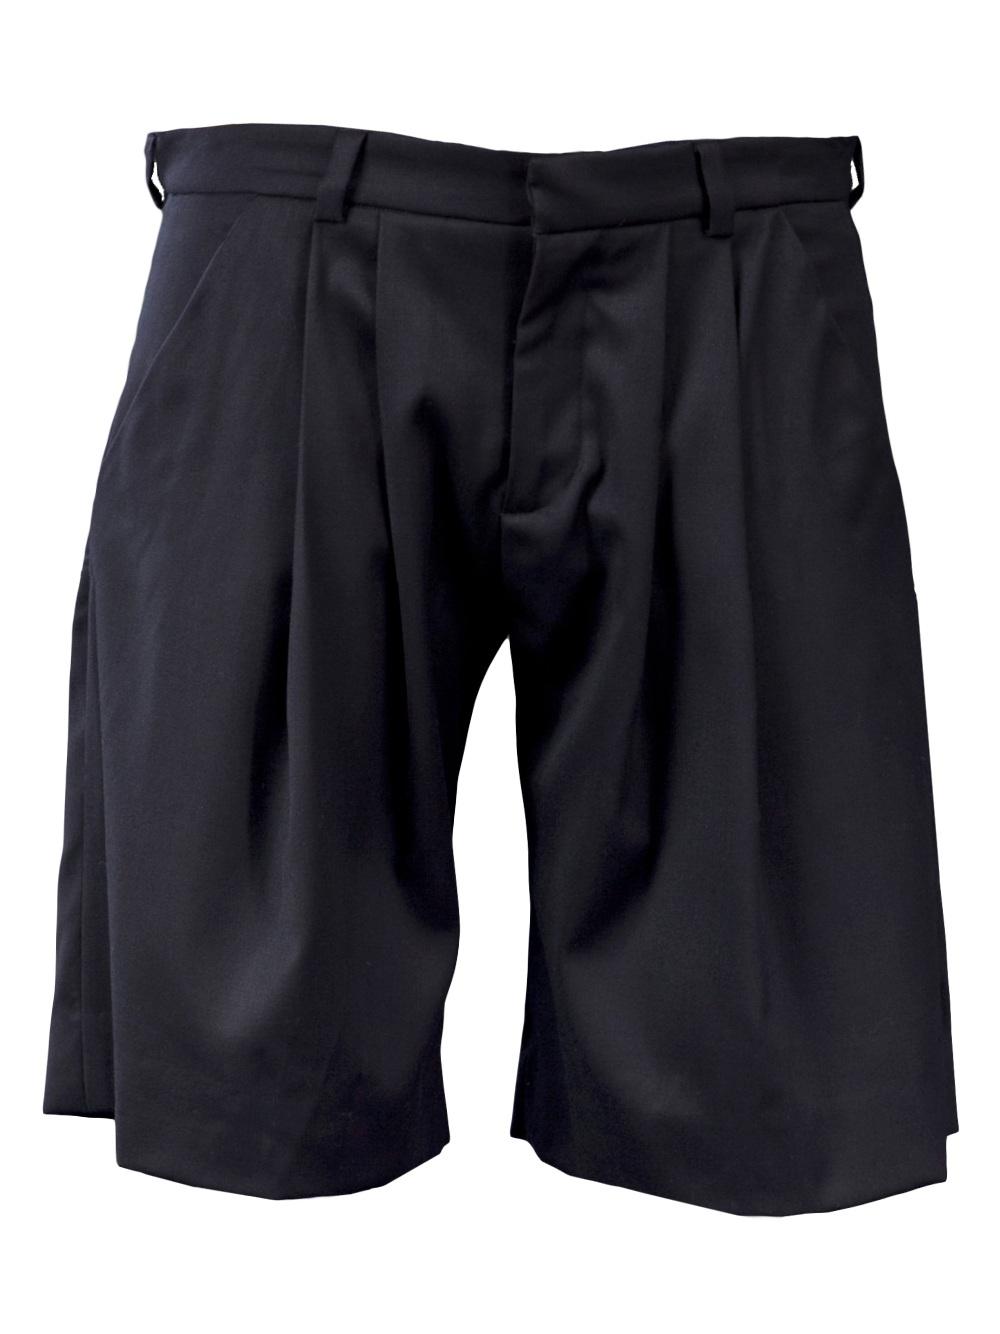 b49cc7f4a46e Lyst - Rochambeau Obolus Combo Pants in Black for Men